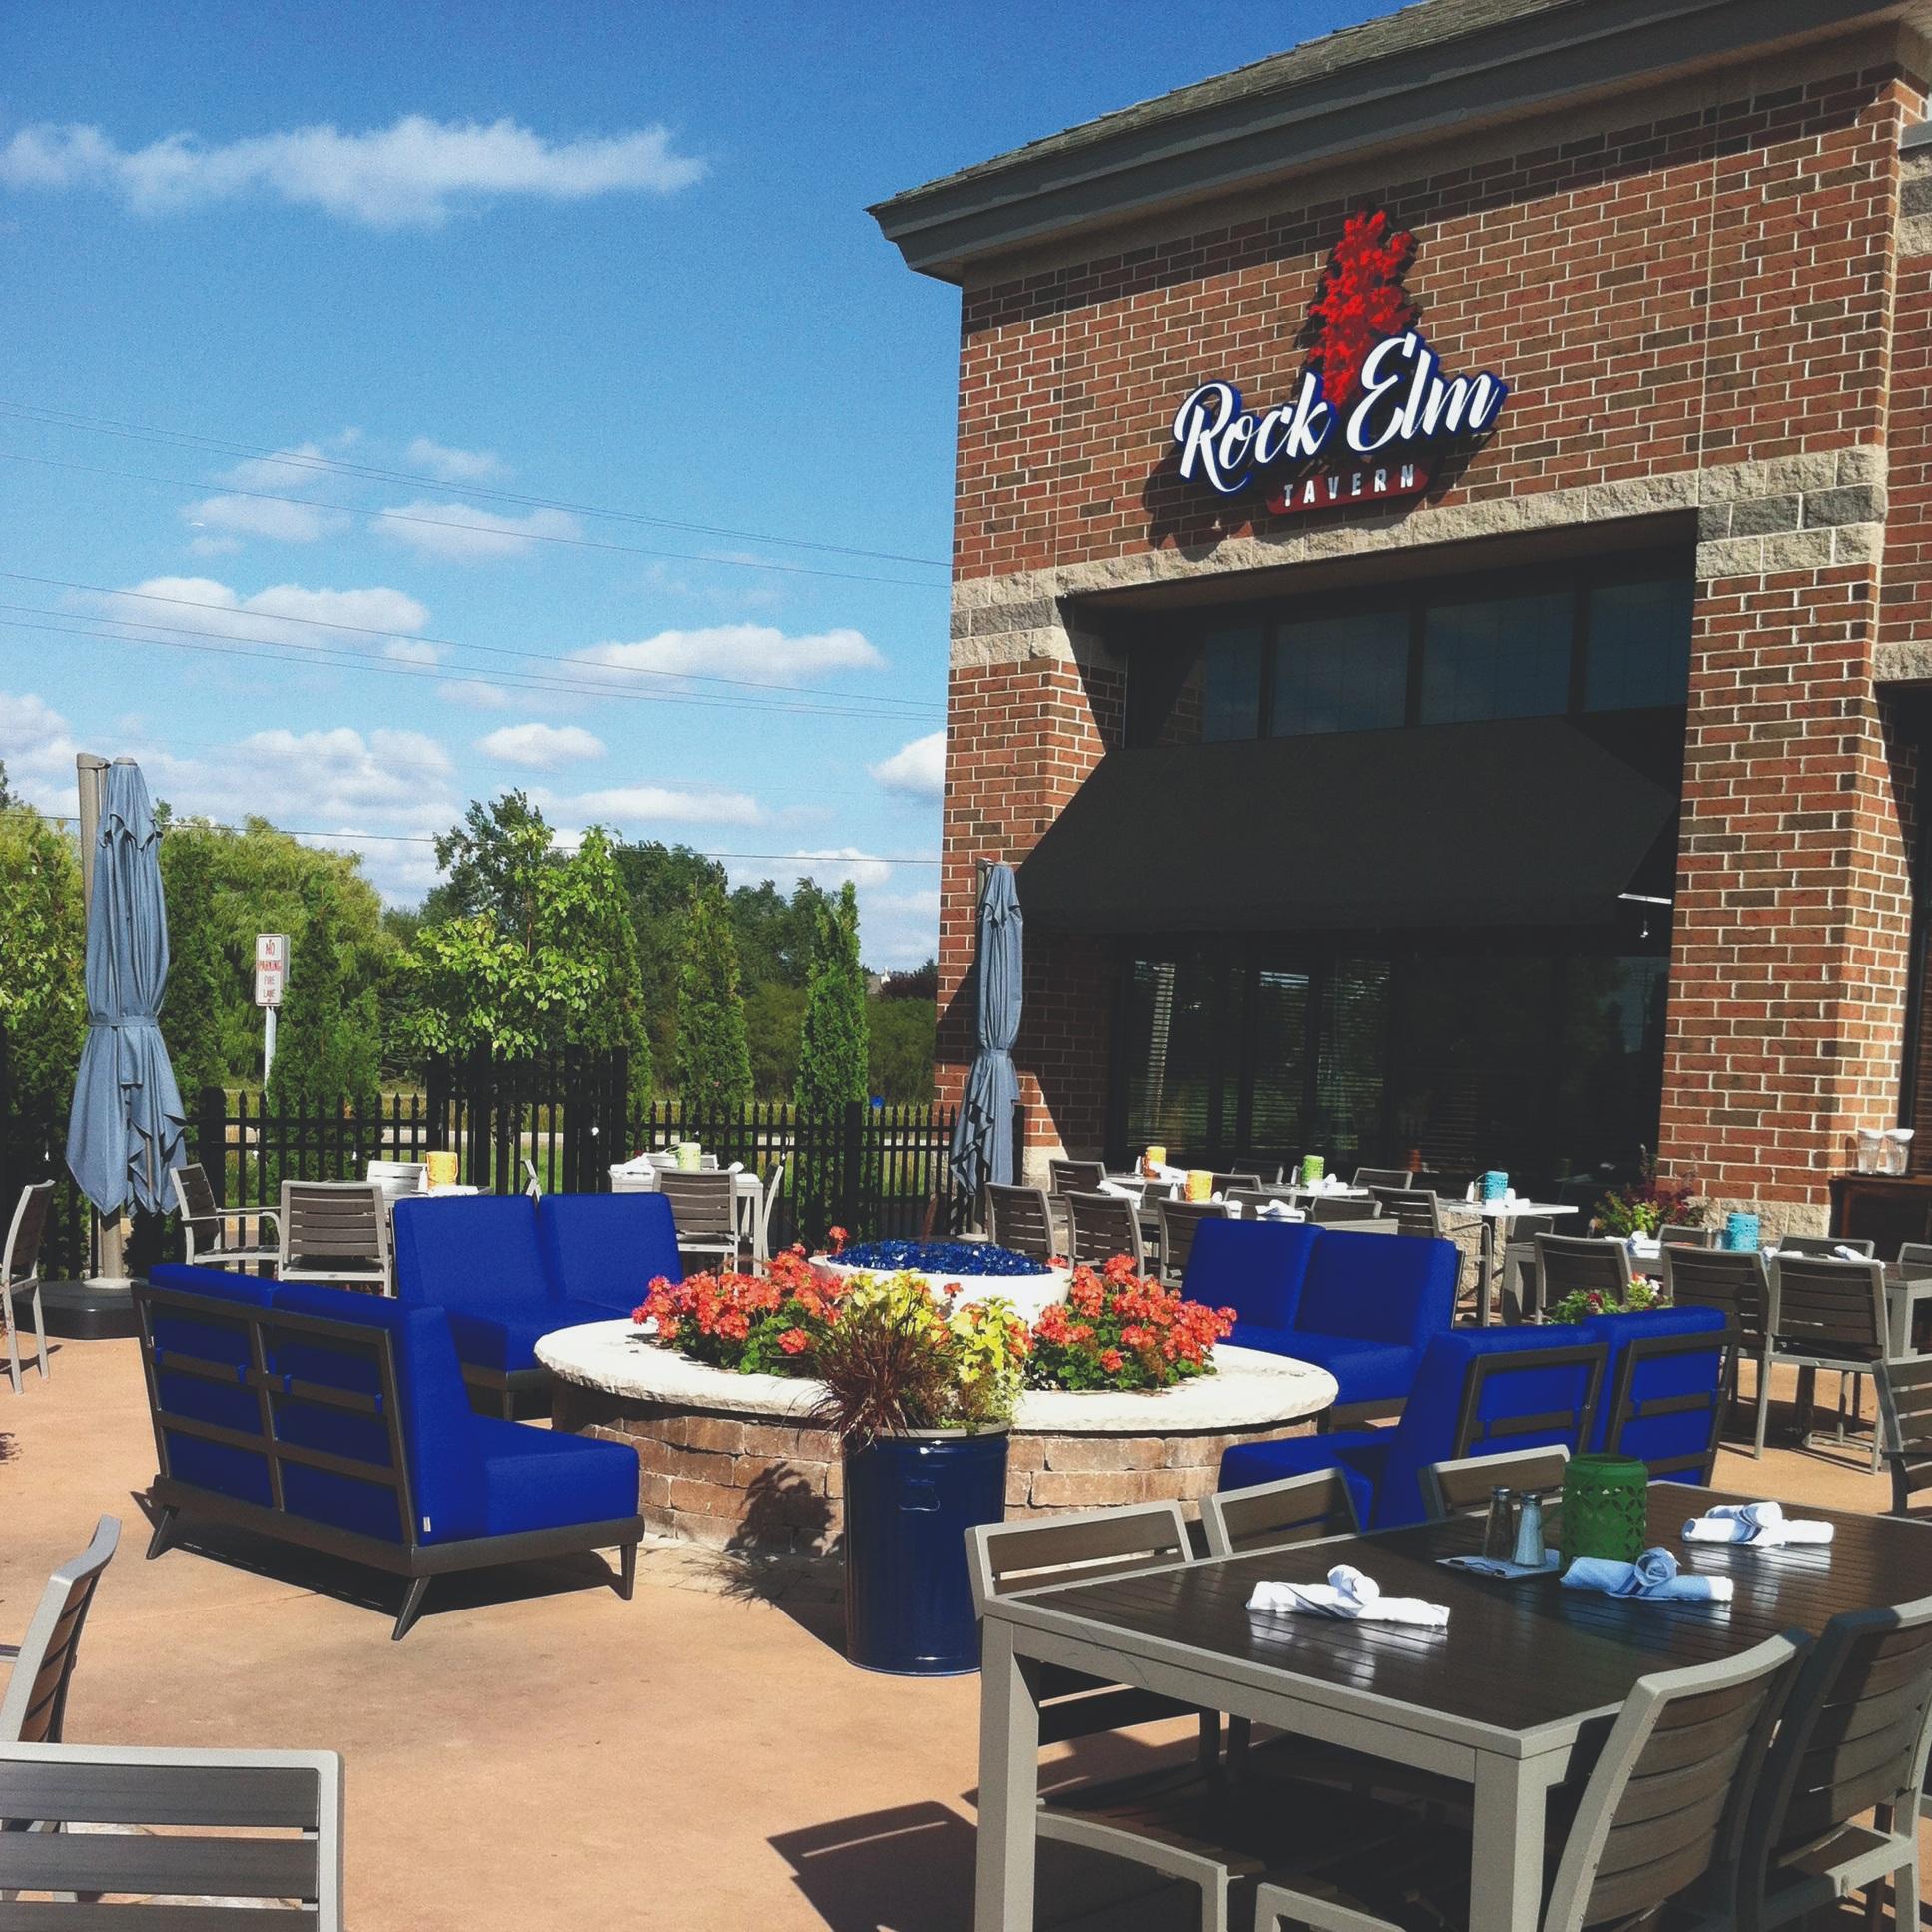 Rock+Elm+Tavern+in+Plymouth%2C+Minnesota